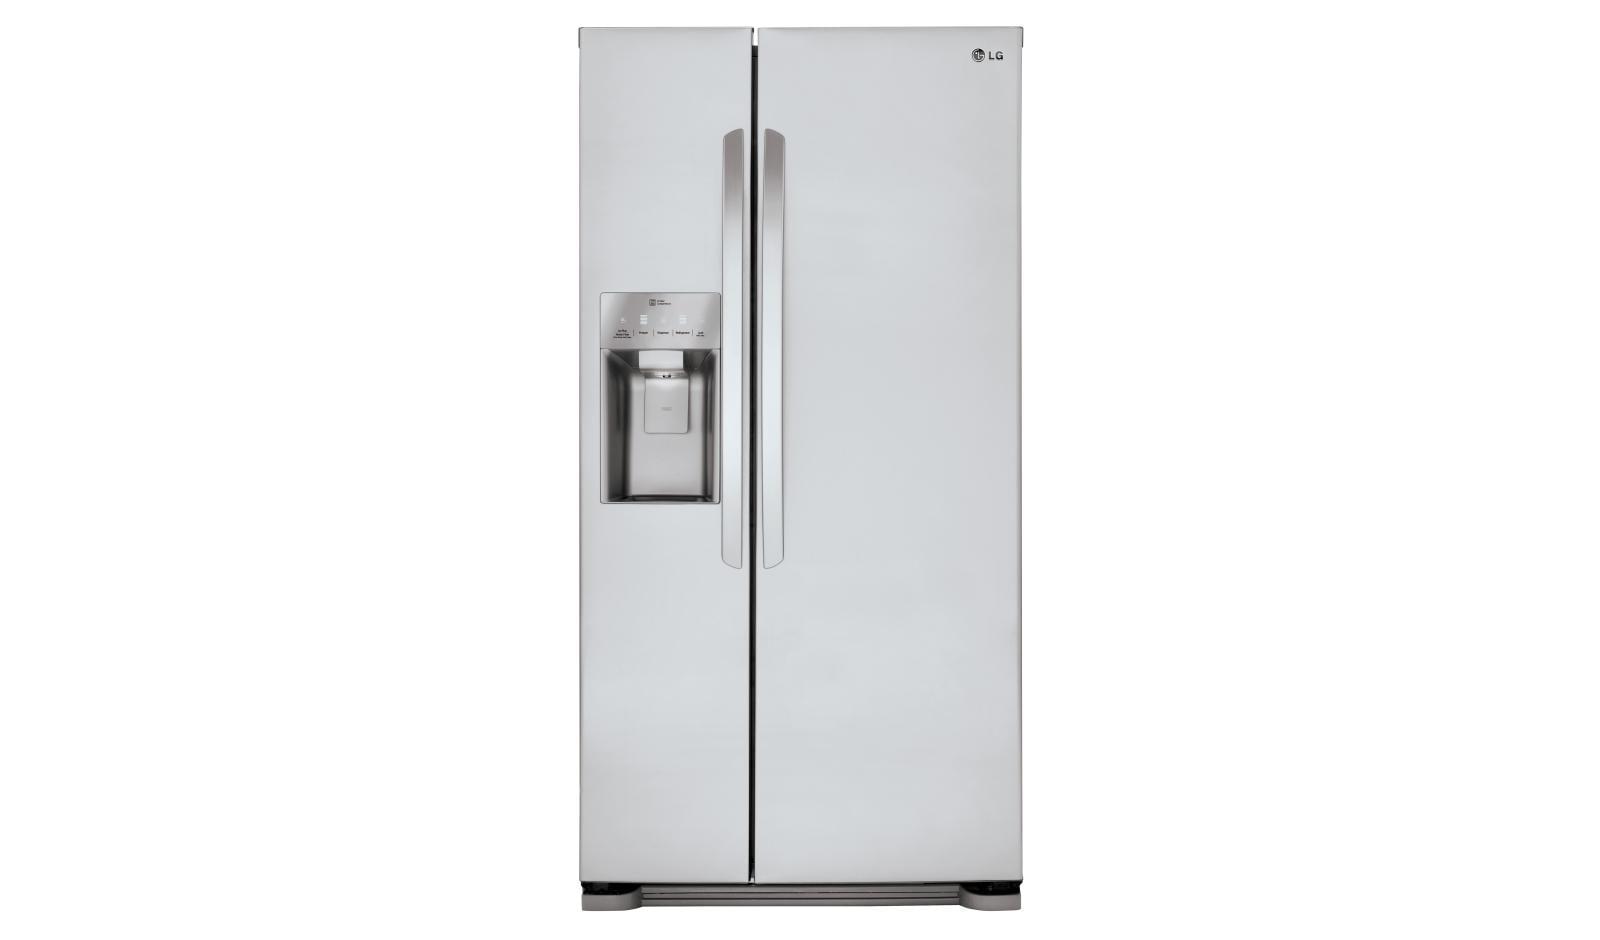 LG LSXS22423S: Side By Side Refrigerator | LG USA